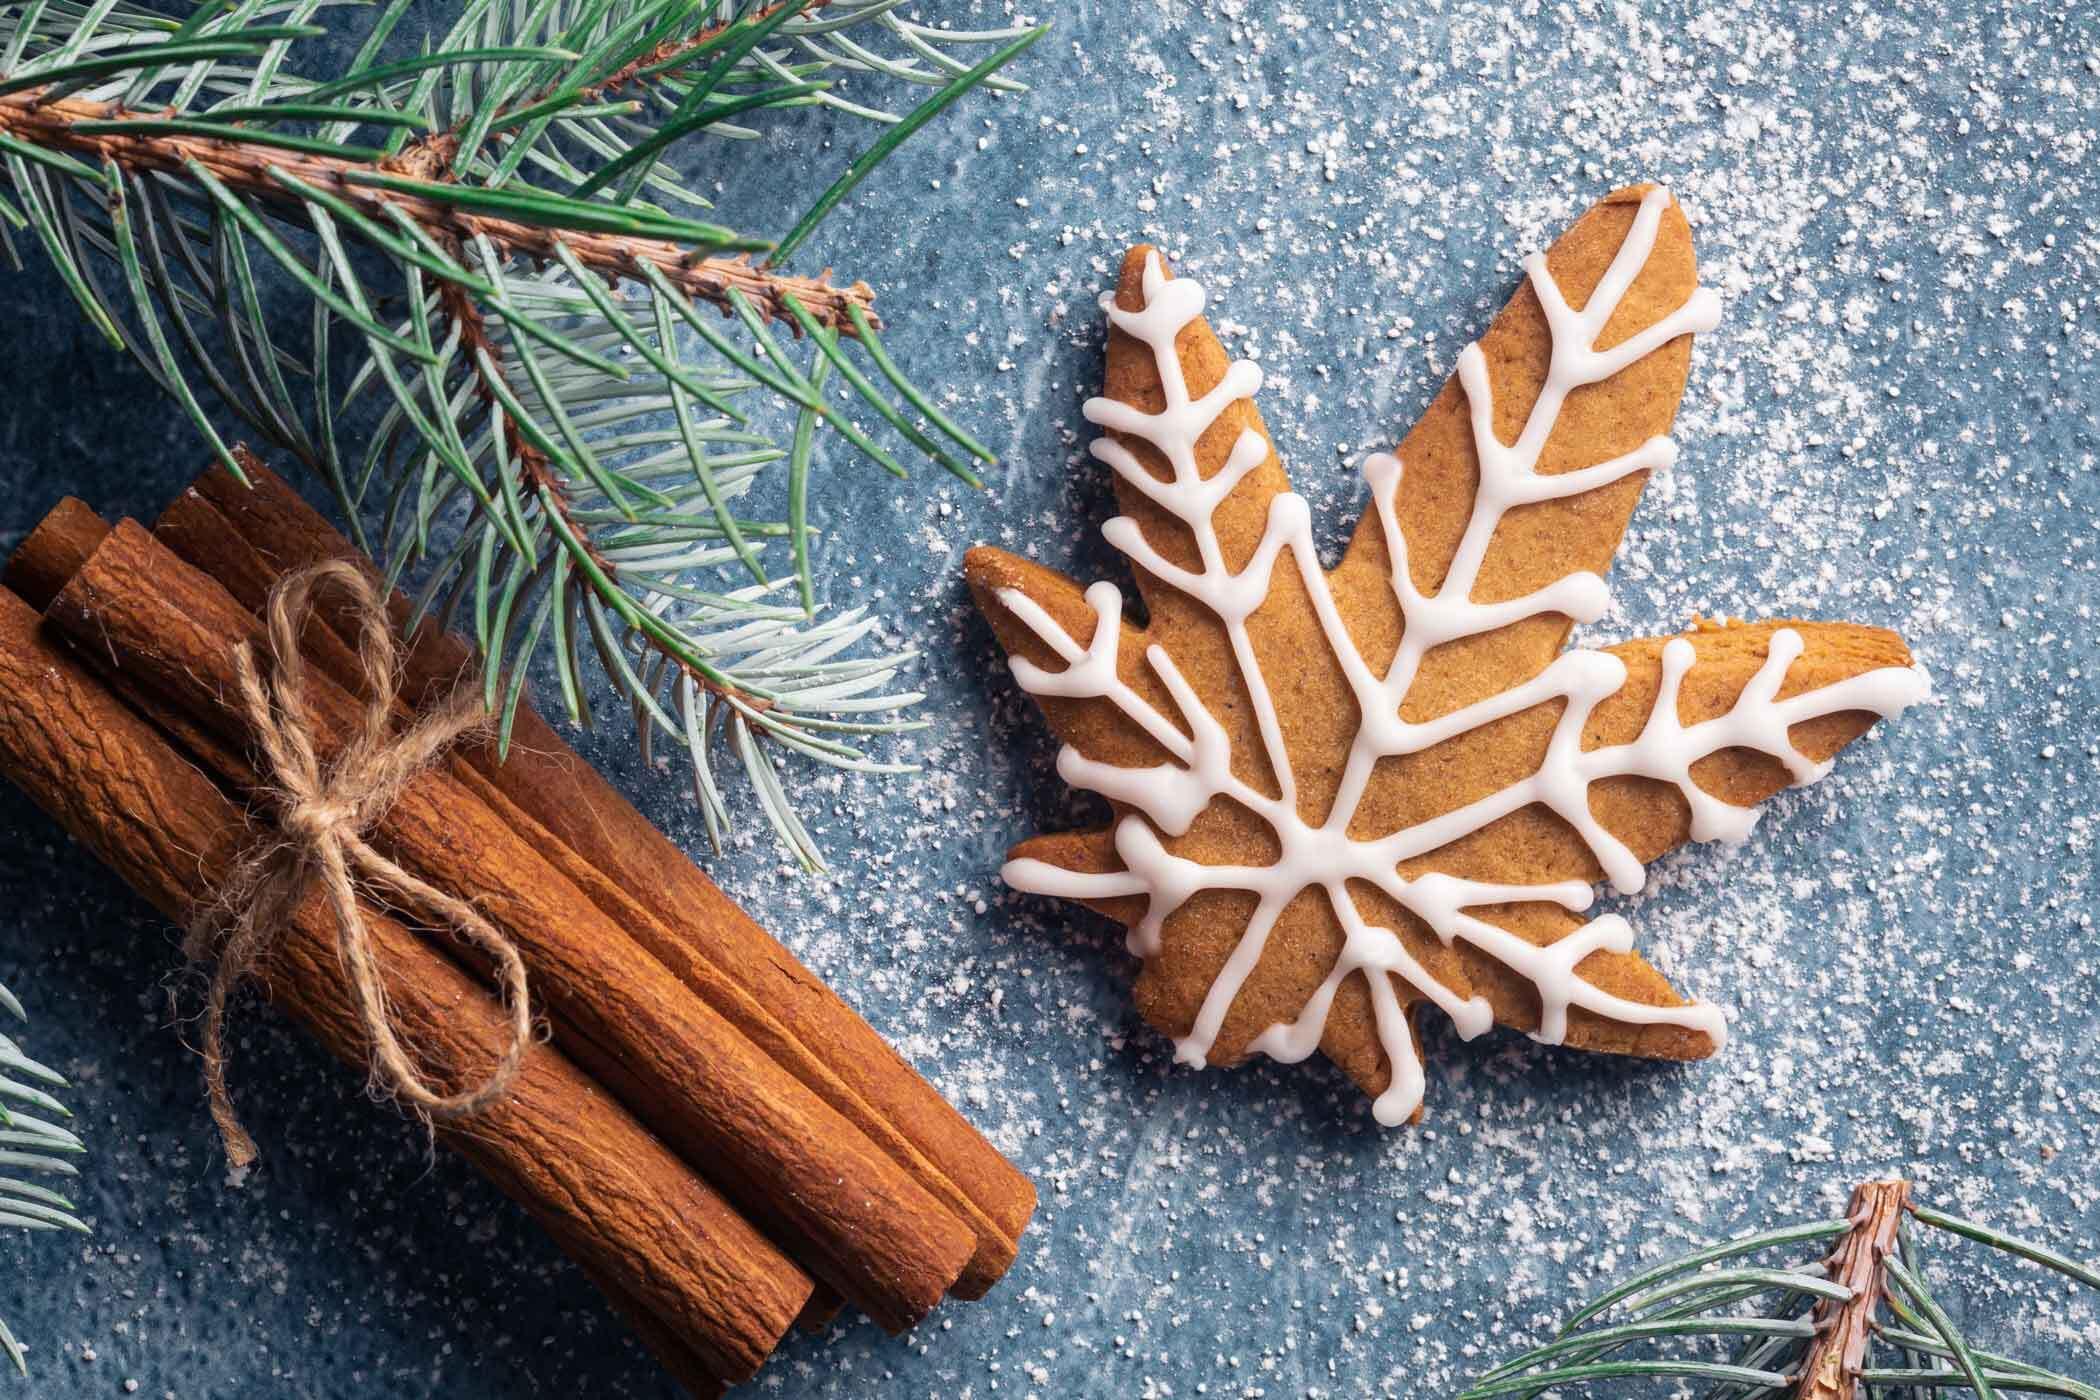 december 2020 photo contest - december-2020-photo-contest-christmas-cannabis-gingerbread-cookie-cinnamon-pine-AdobeStock_392758077